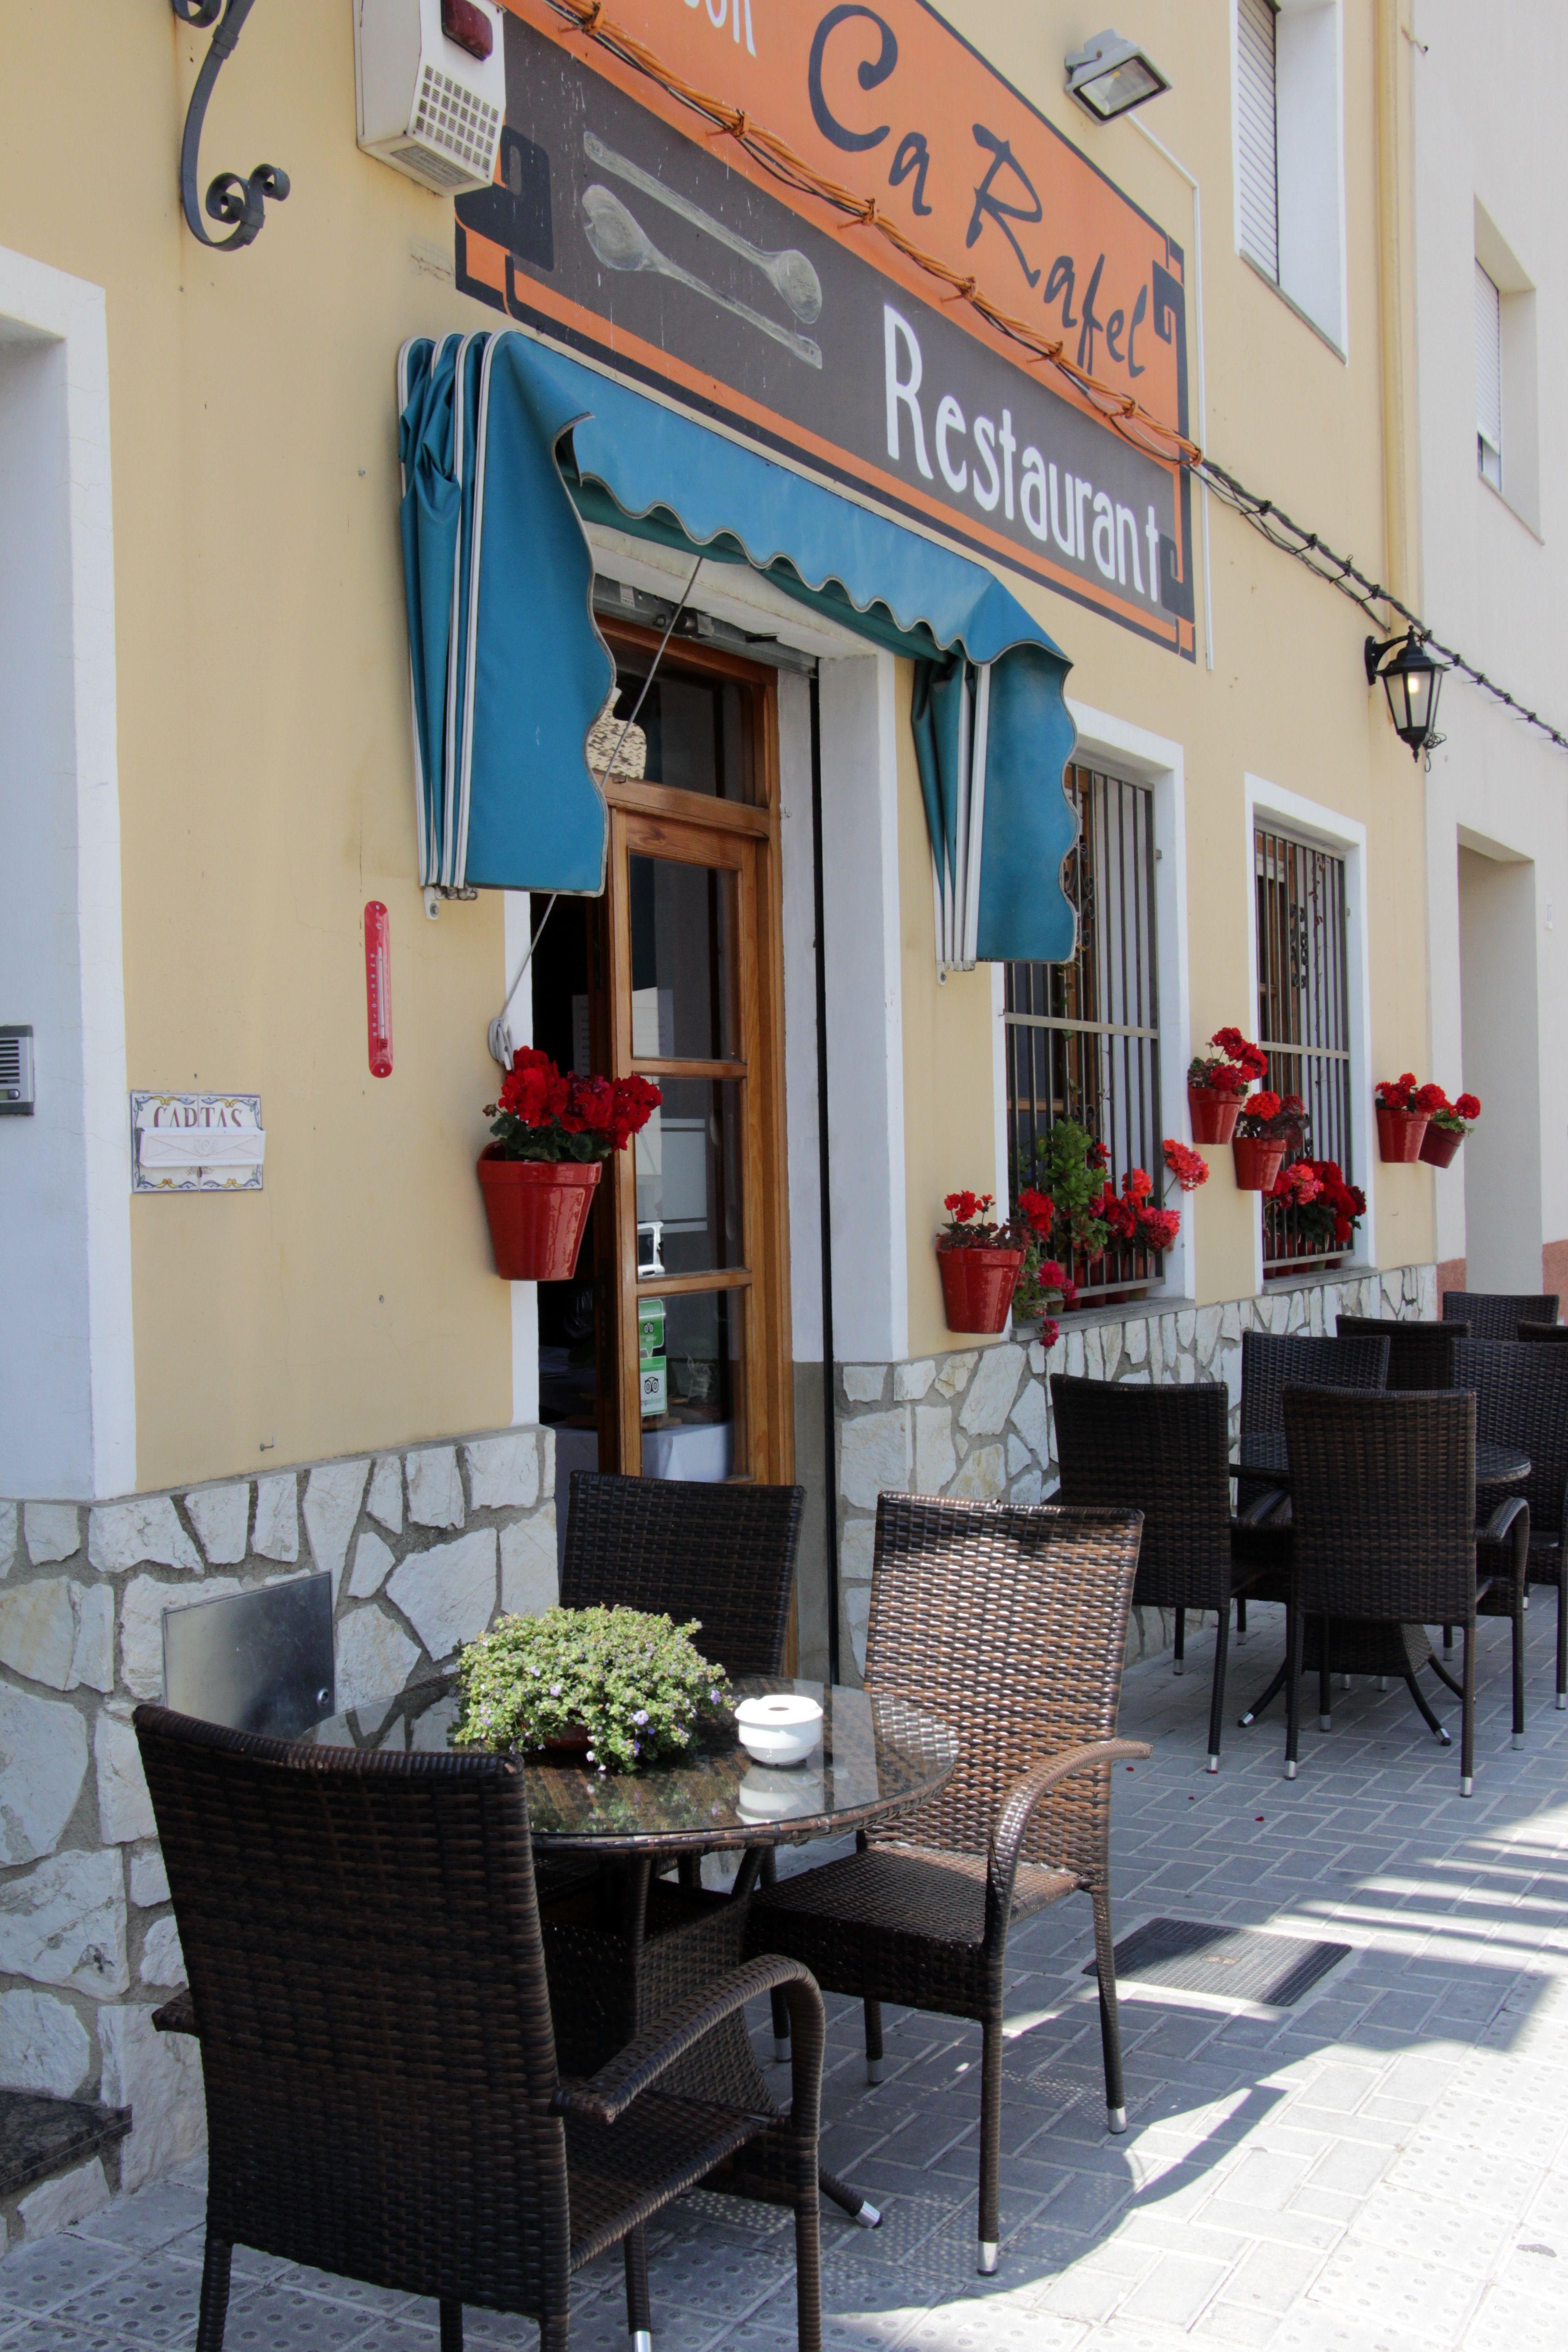 Foto 8 de Mesón - restaurante en Benimantell | Mesón Ca Rafel